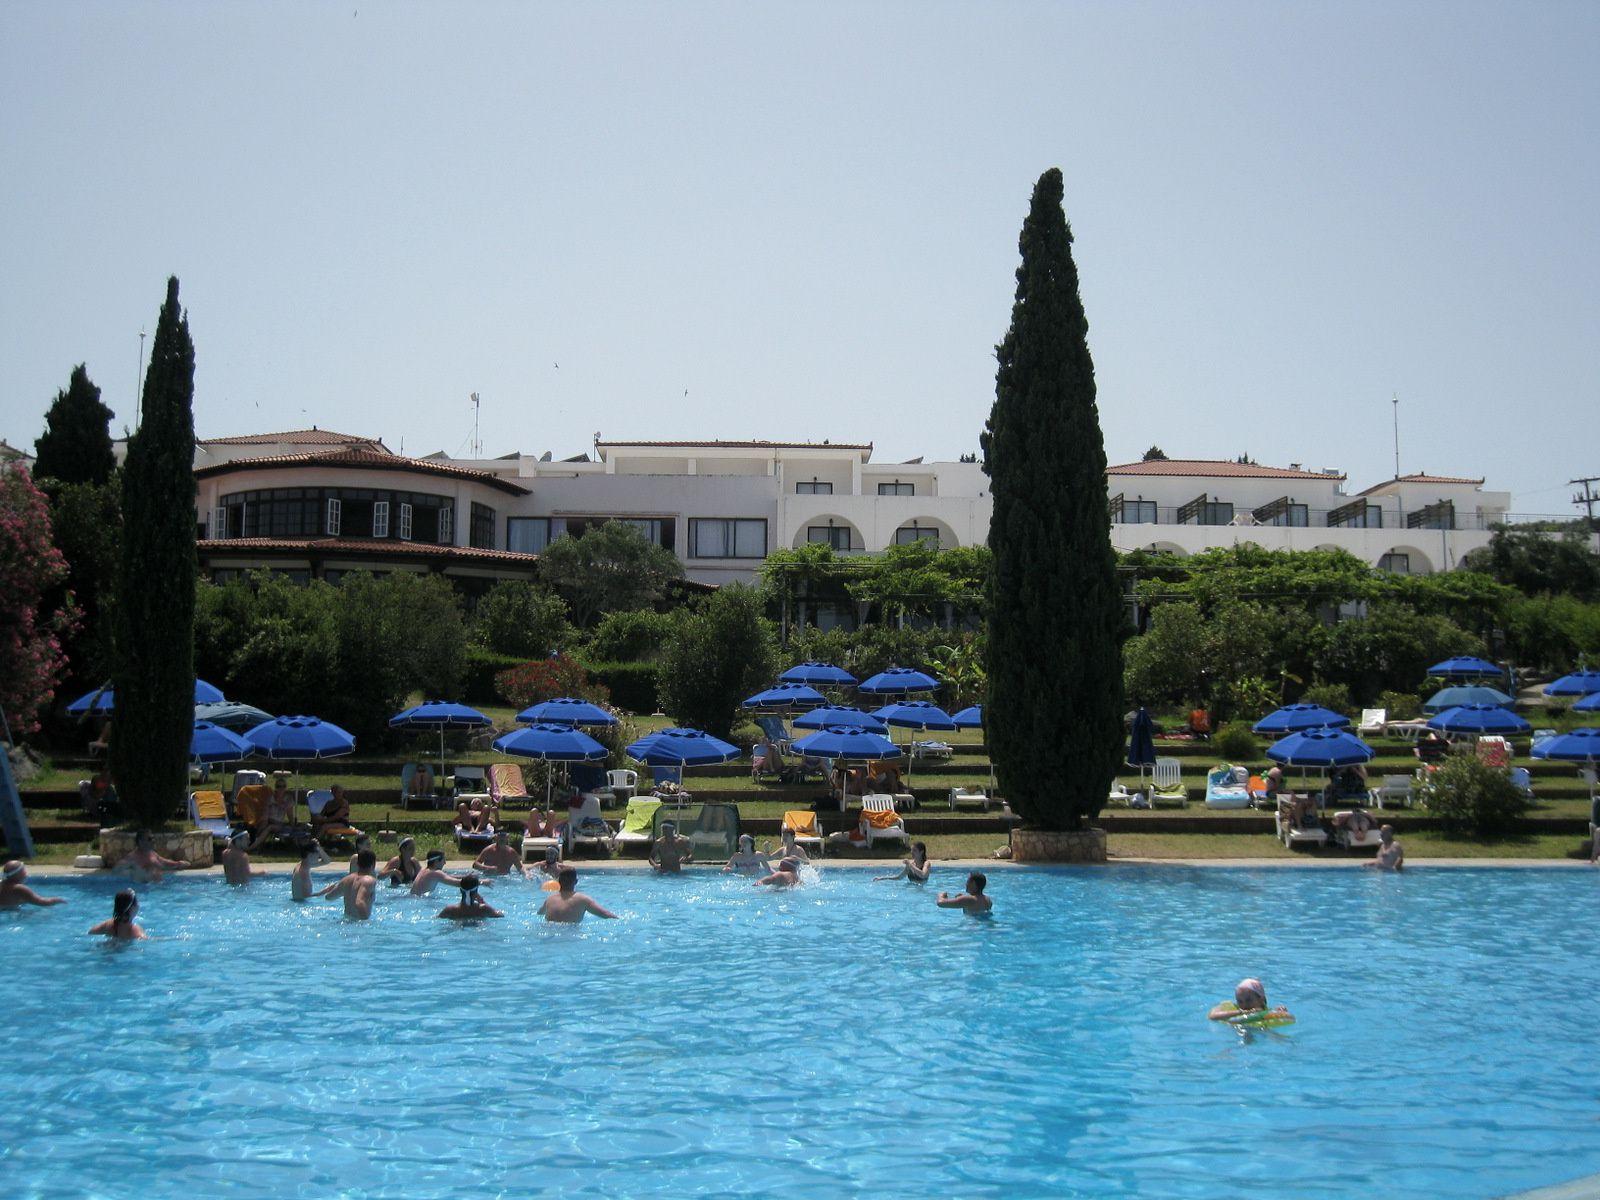 Club Marmara à Kalamata, Grèce